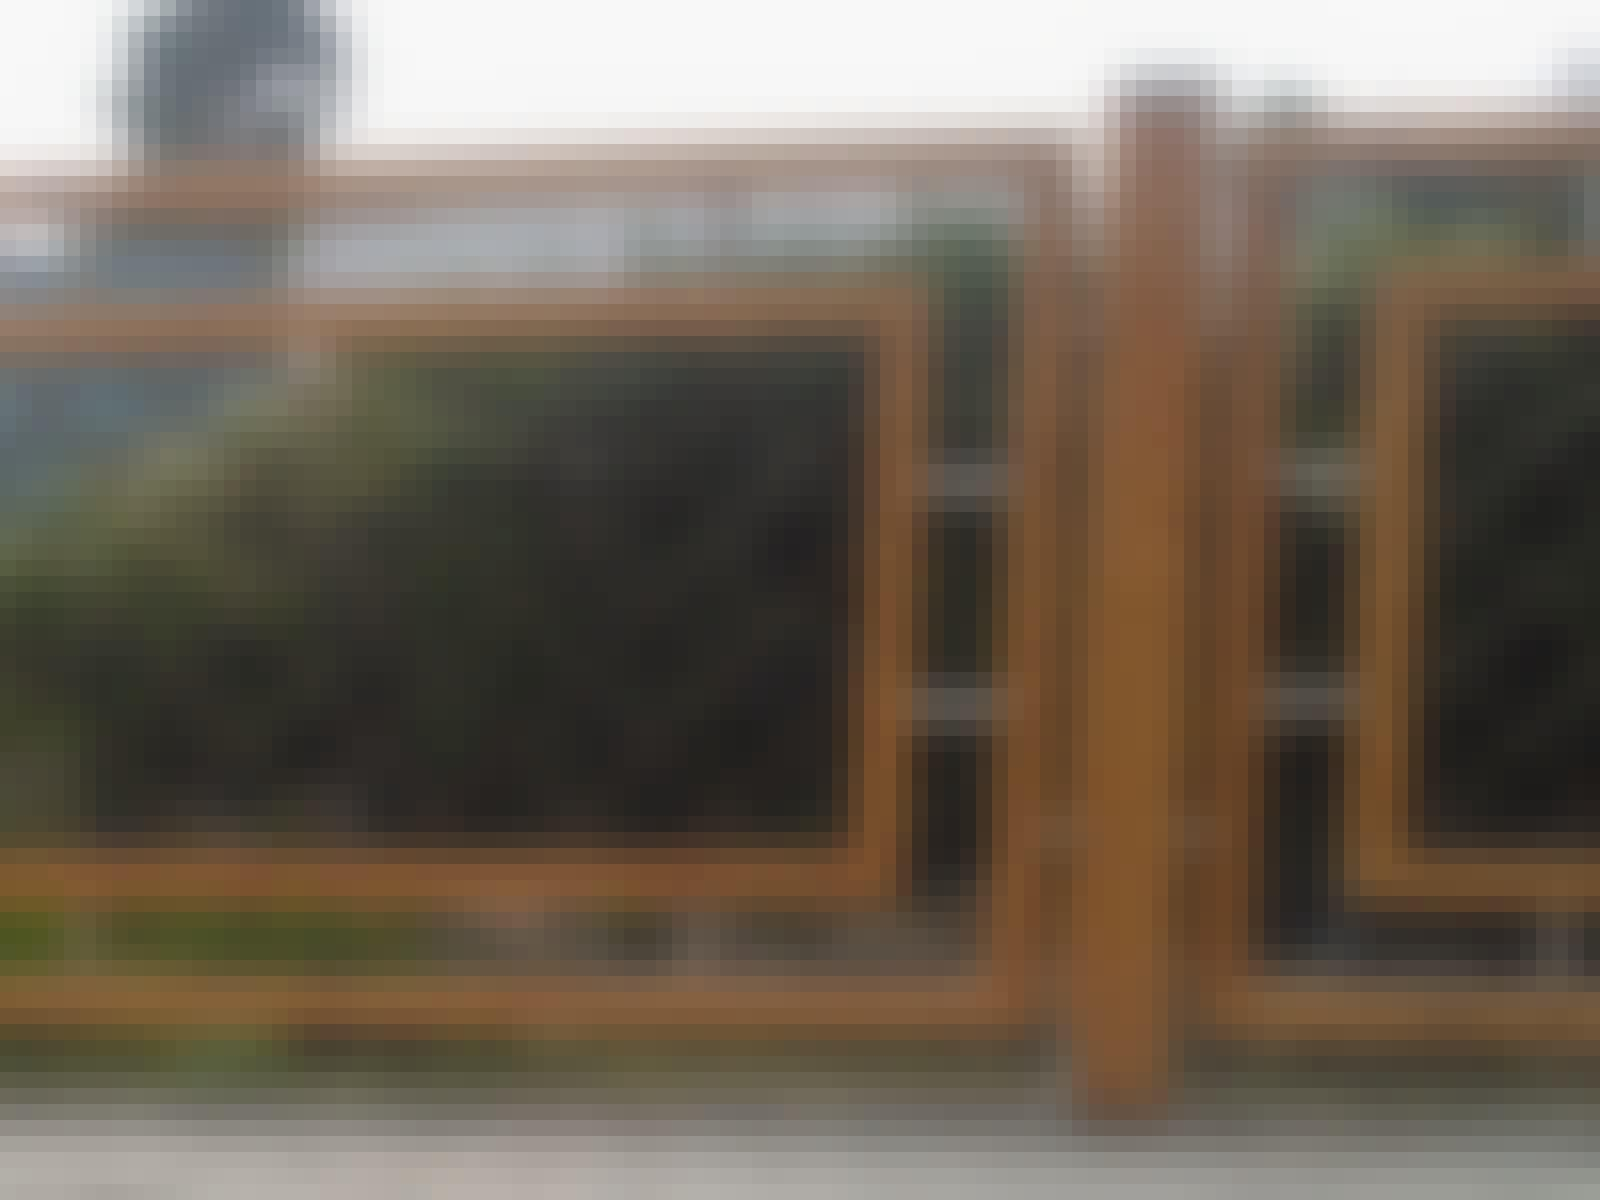 Altan staket